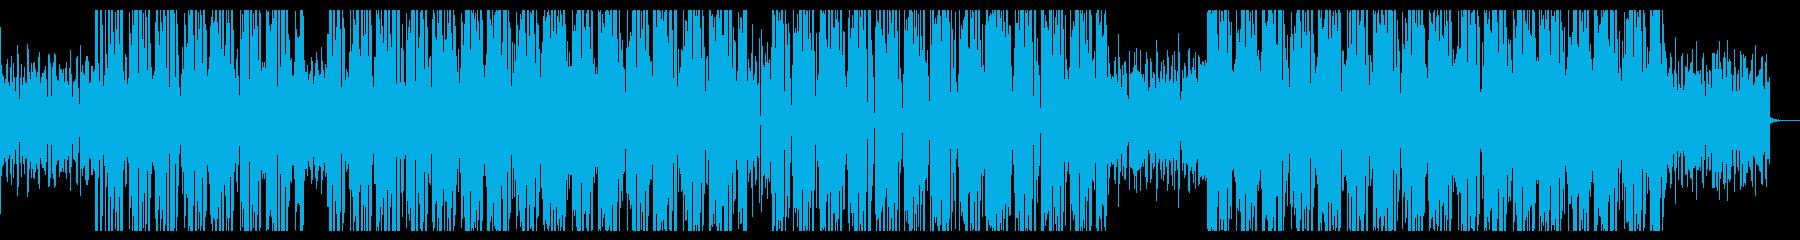 Lo-Fiビート_ファンキー_チルの再生済みの波形